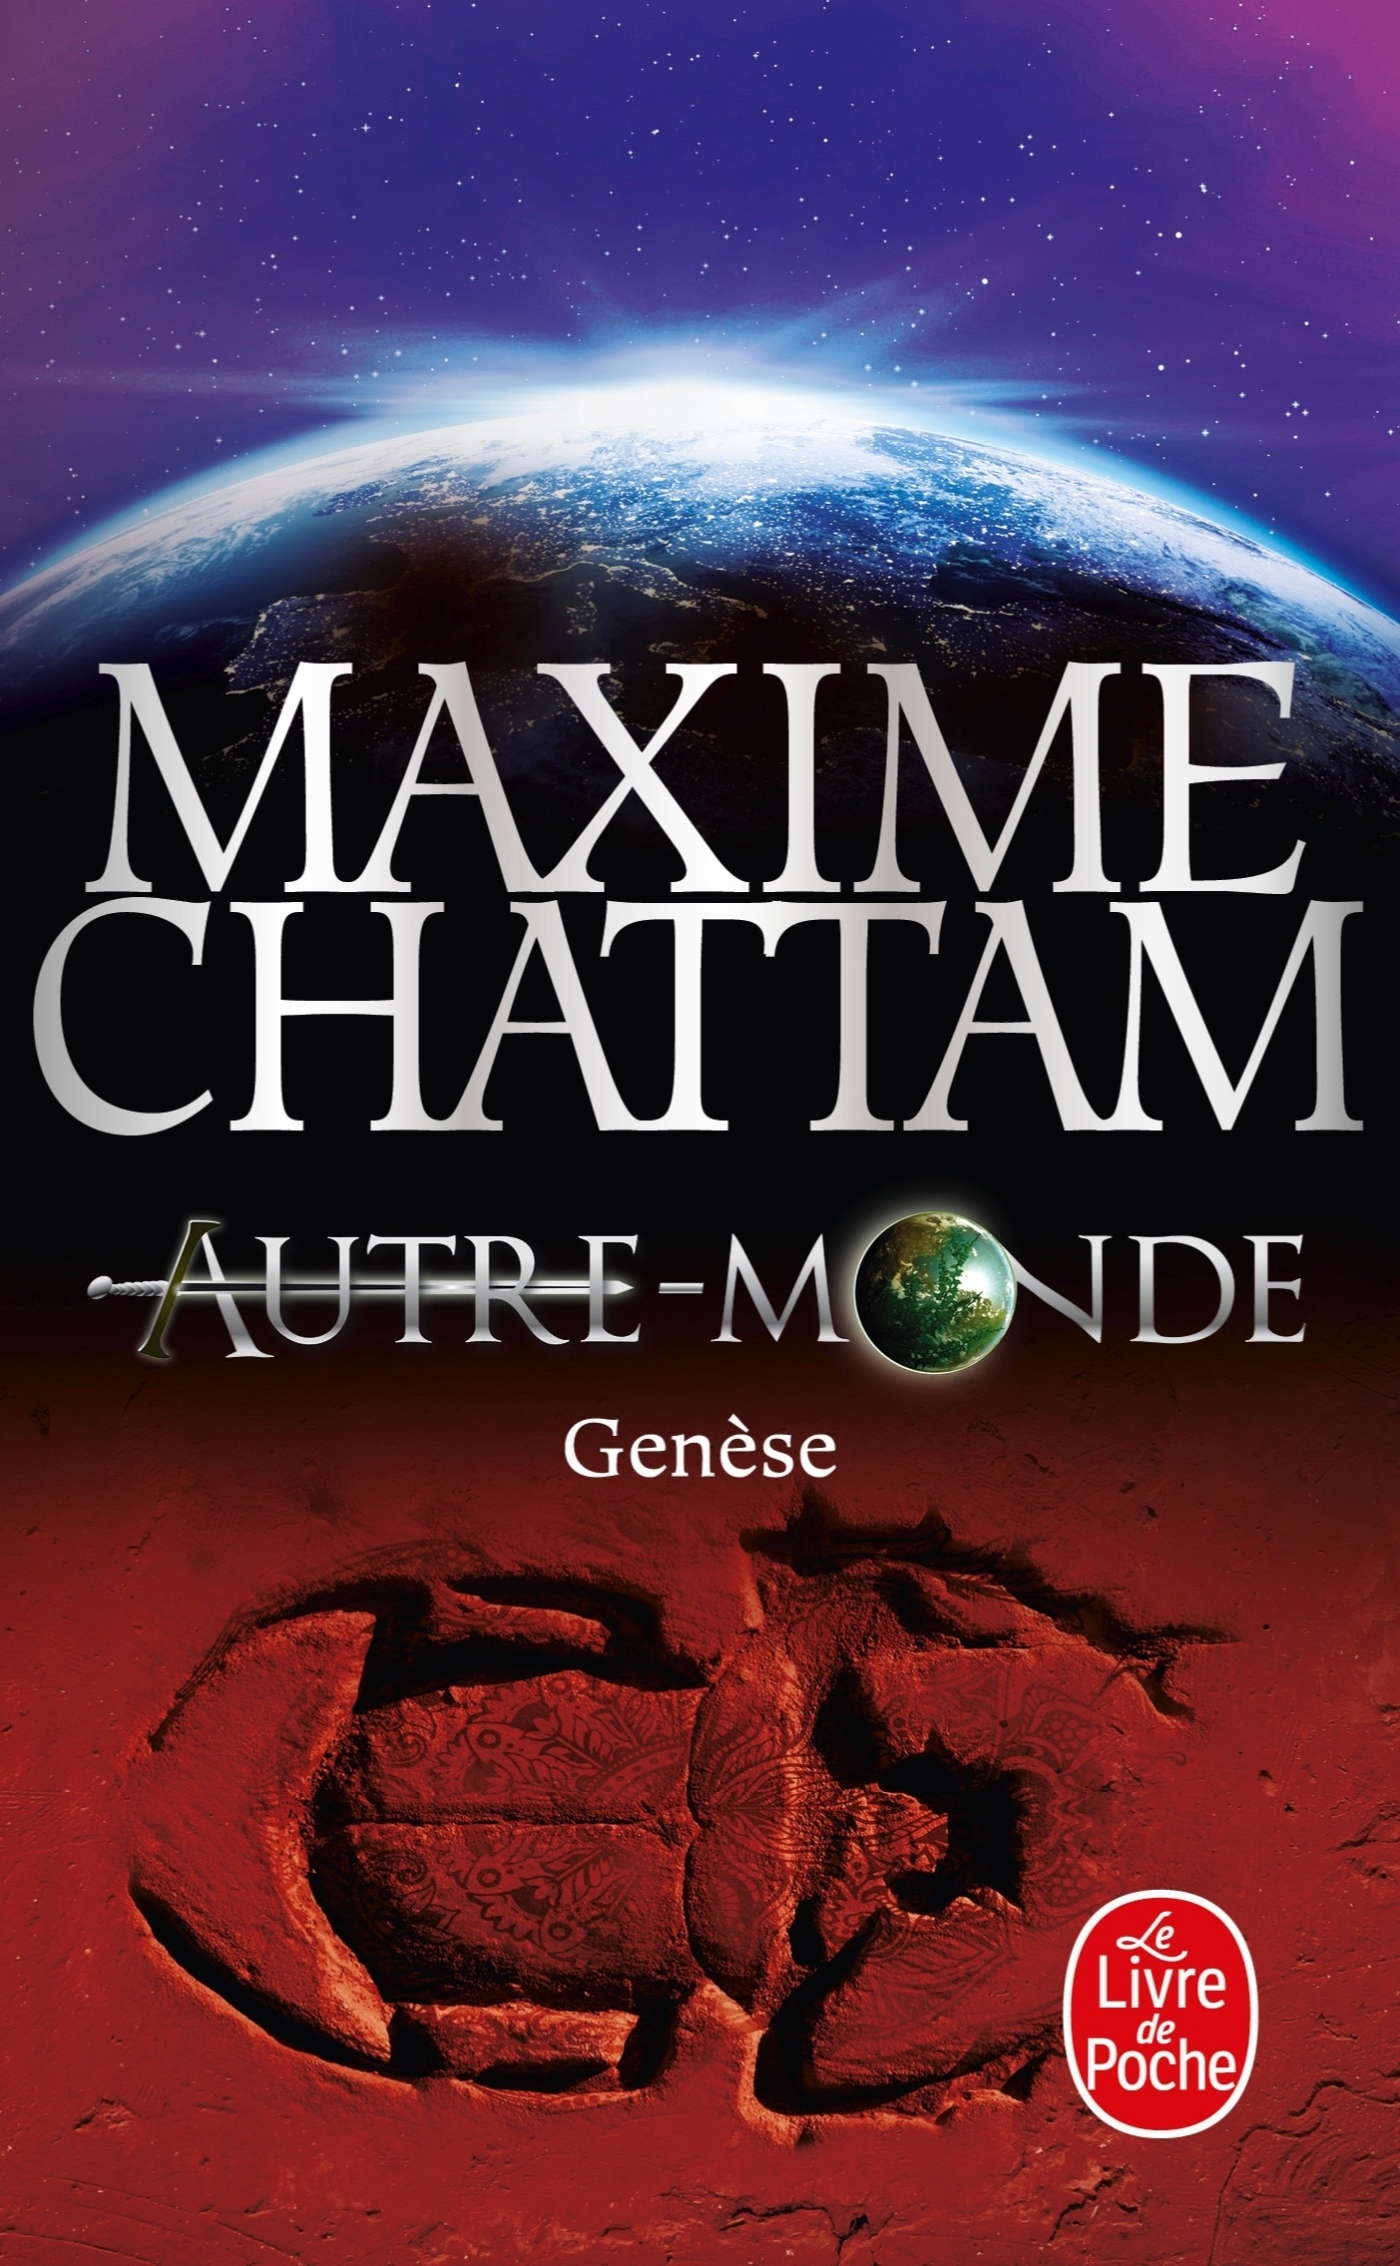 GENESE (AUTRE-MONDE, TOME 7)